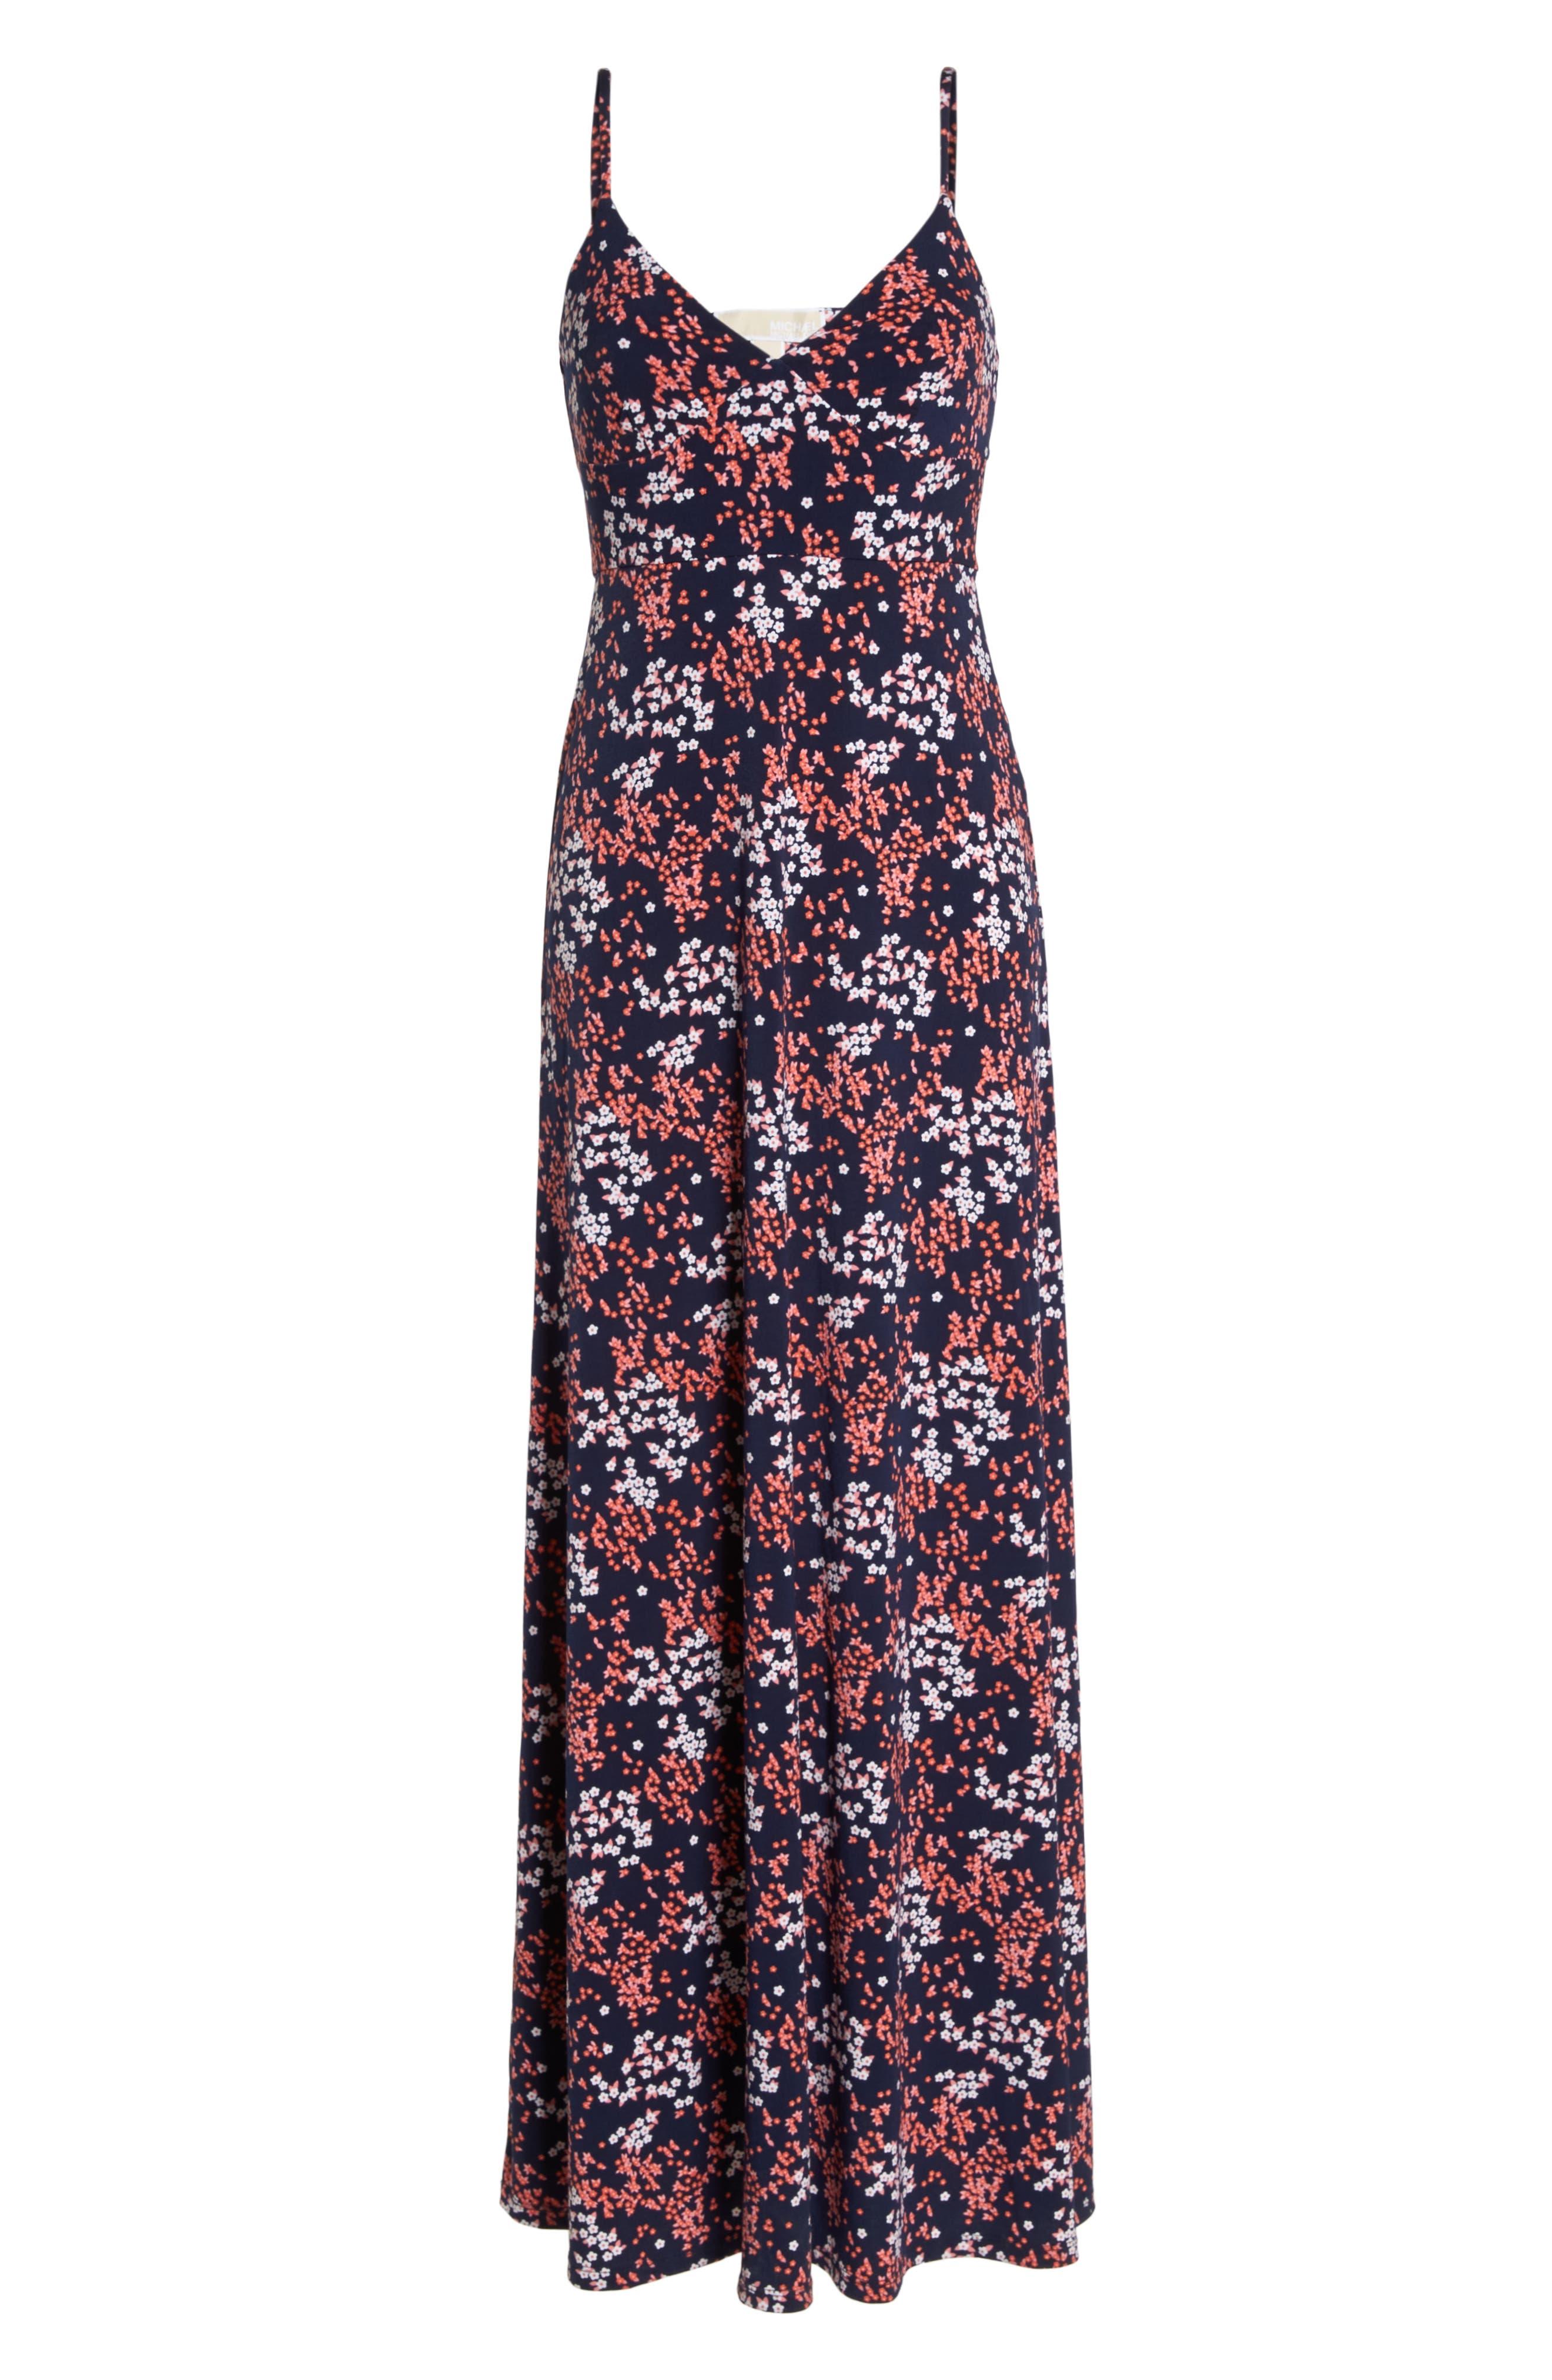 Bloom Maxi Dress,                             Alternate thumbnail 7, color,